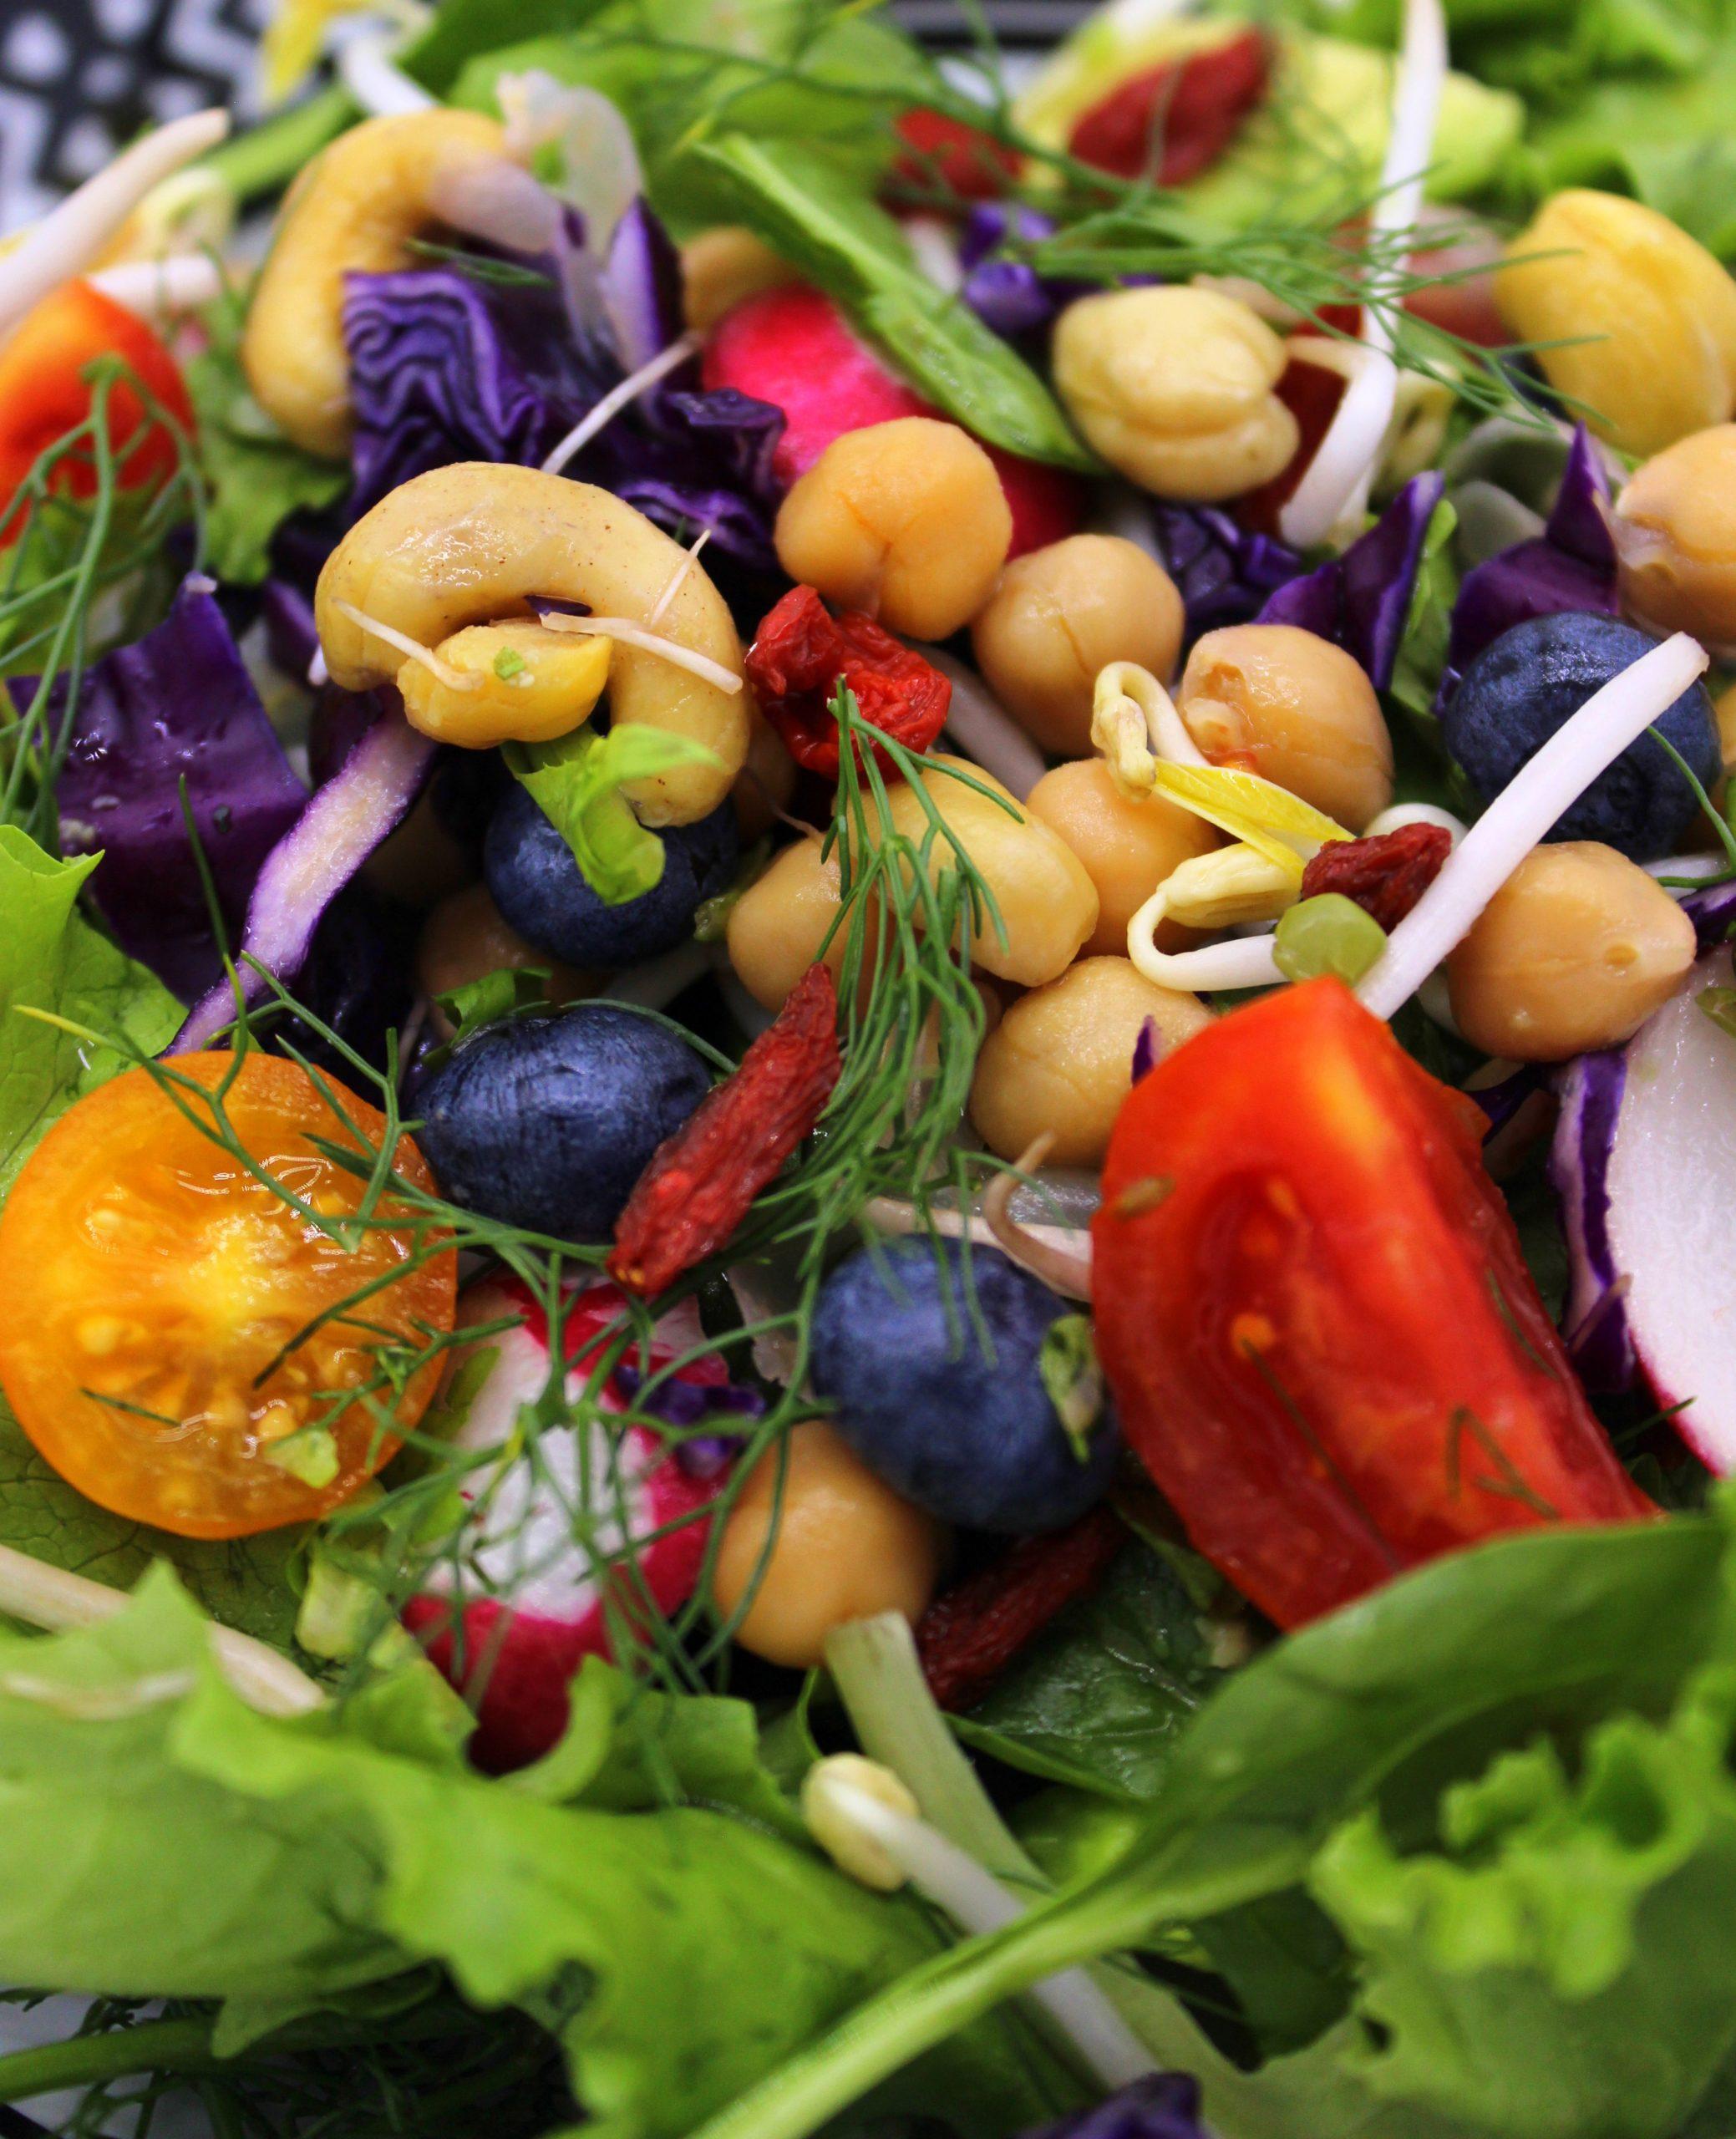 Salad in close-up